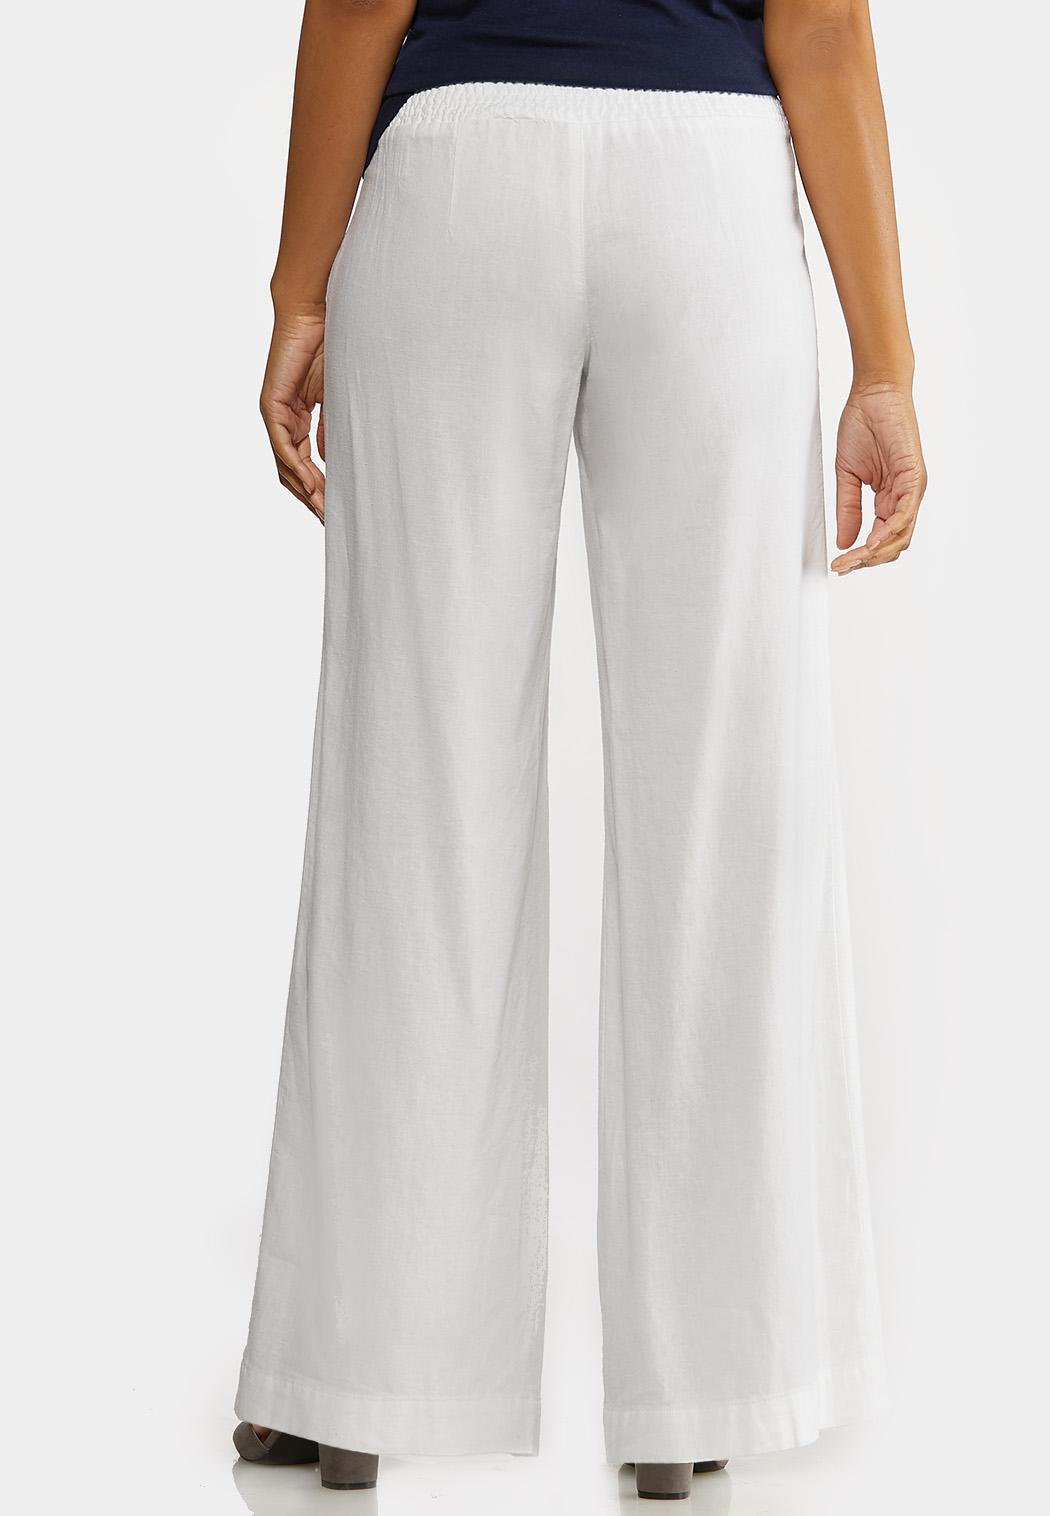 Pull-On Linen Pants (Item #44174177)